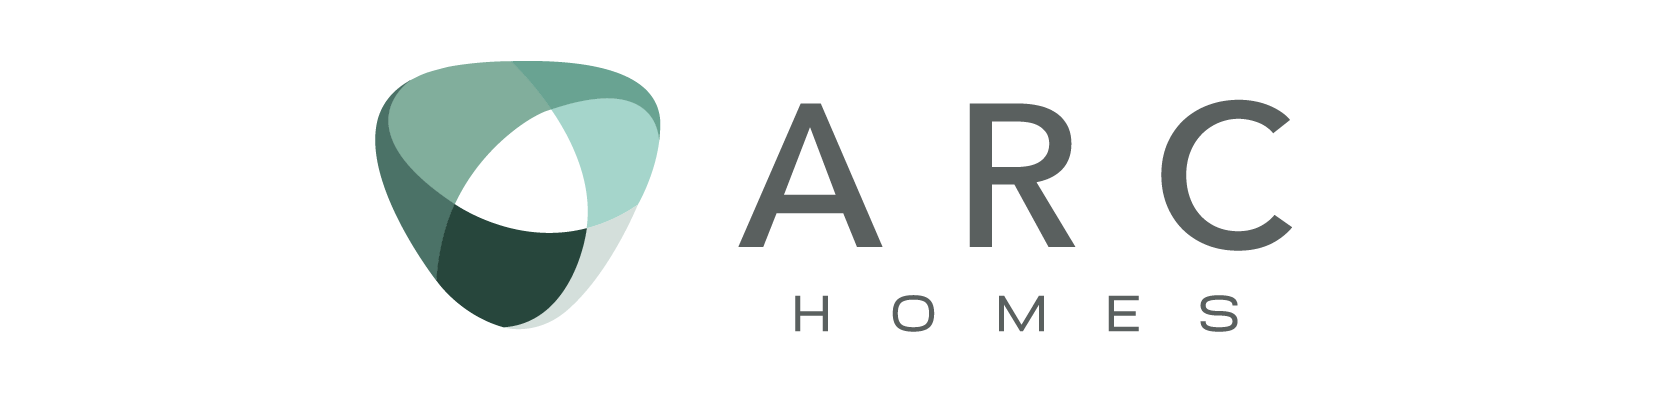 roi-real-estate--arc-homes